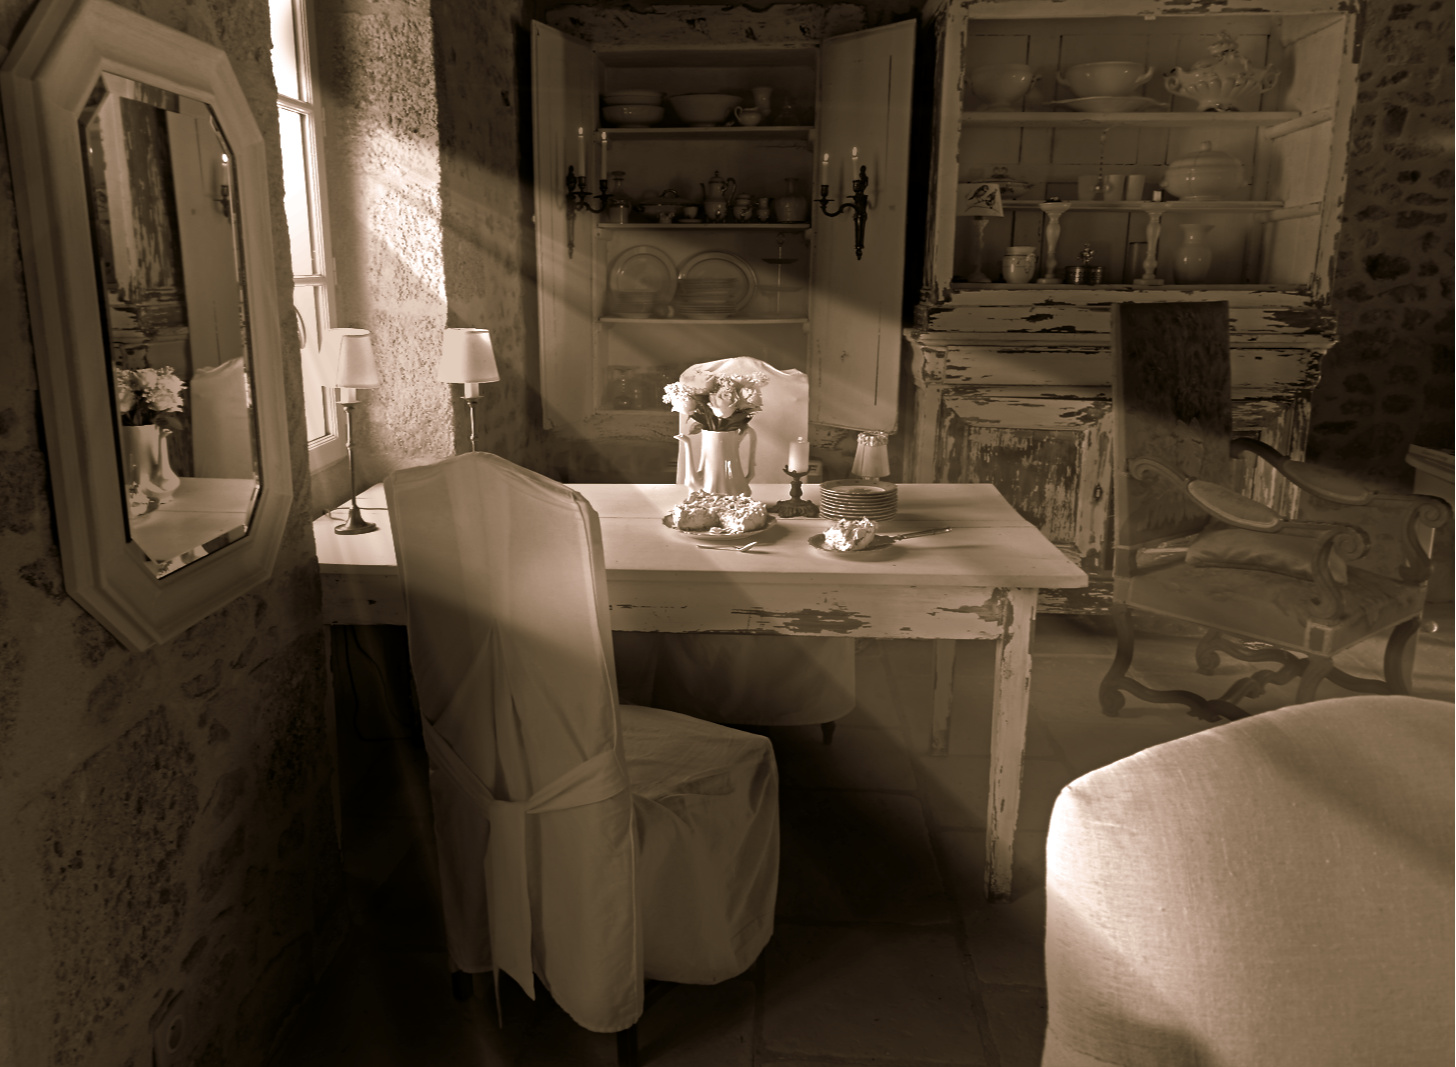 colette malpaud #whitecottagecharm #uncottageenfrance #campagnechic #frenchinterior #frenchfarmhousestyle #frenchcountry #frenchliving #fixerupperstyle #frenchcountrycottage #allthingsfrench #frenchcottage #farmhousevignette #cottagevignette #chippypaint #frenchdecoration #fermette #countrychic #rustique #rusticdecor #decorustic #cottagedecor #maisondecampagne #campagnedecoration #countryhomemag #brocante